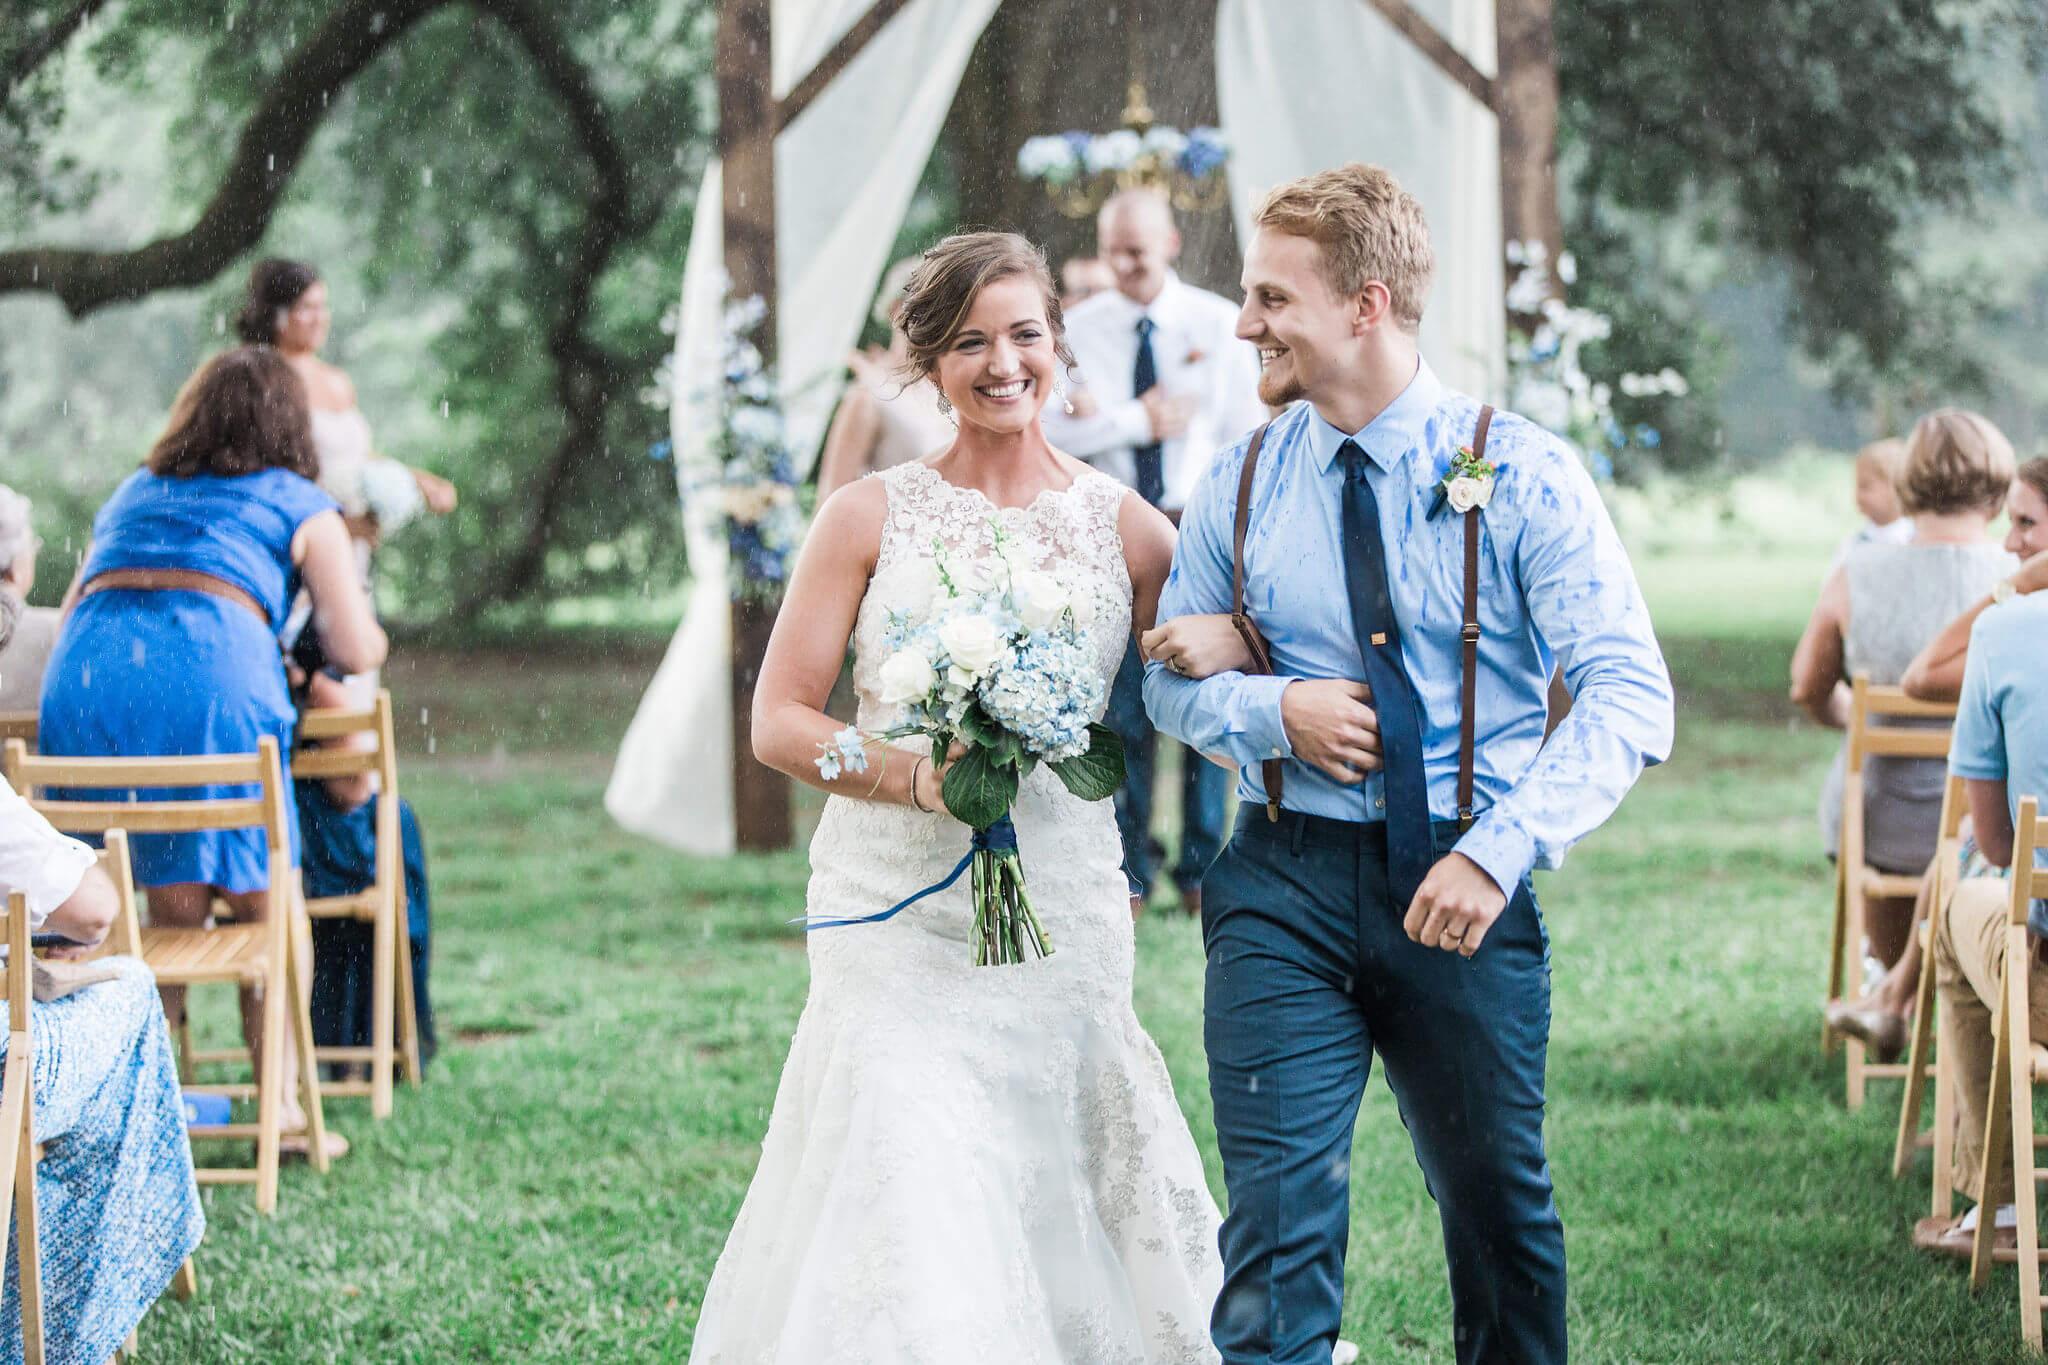 apt-b-photography-savannah-wedding-photographer-savannah-wedding-savannah-elopement-intimate-wedding-photographer-119.JPG